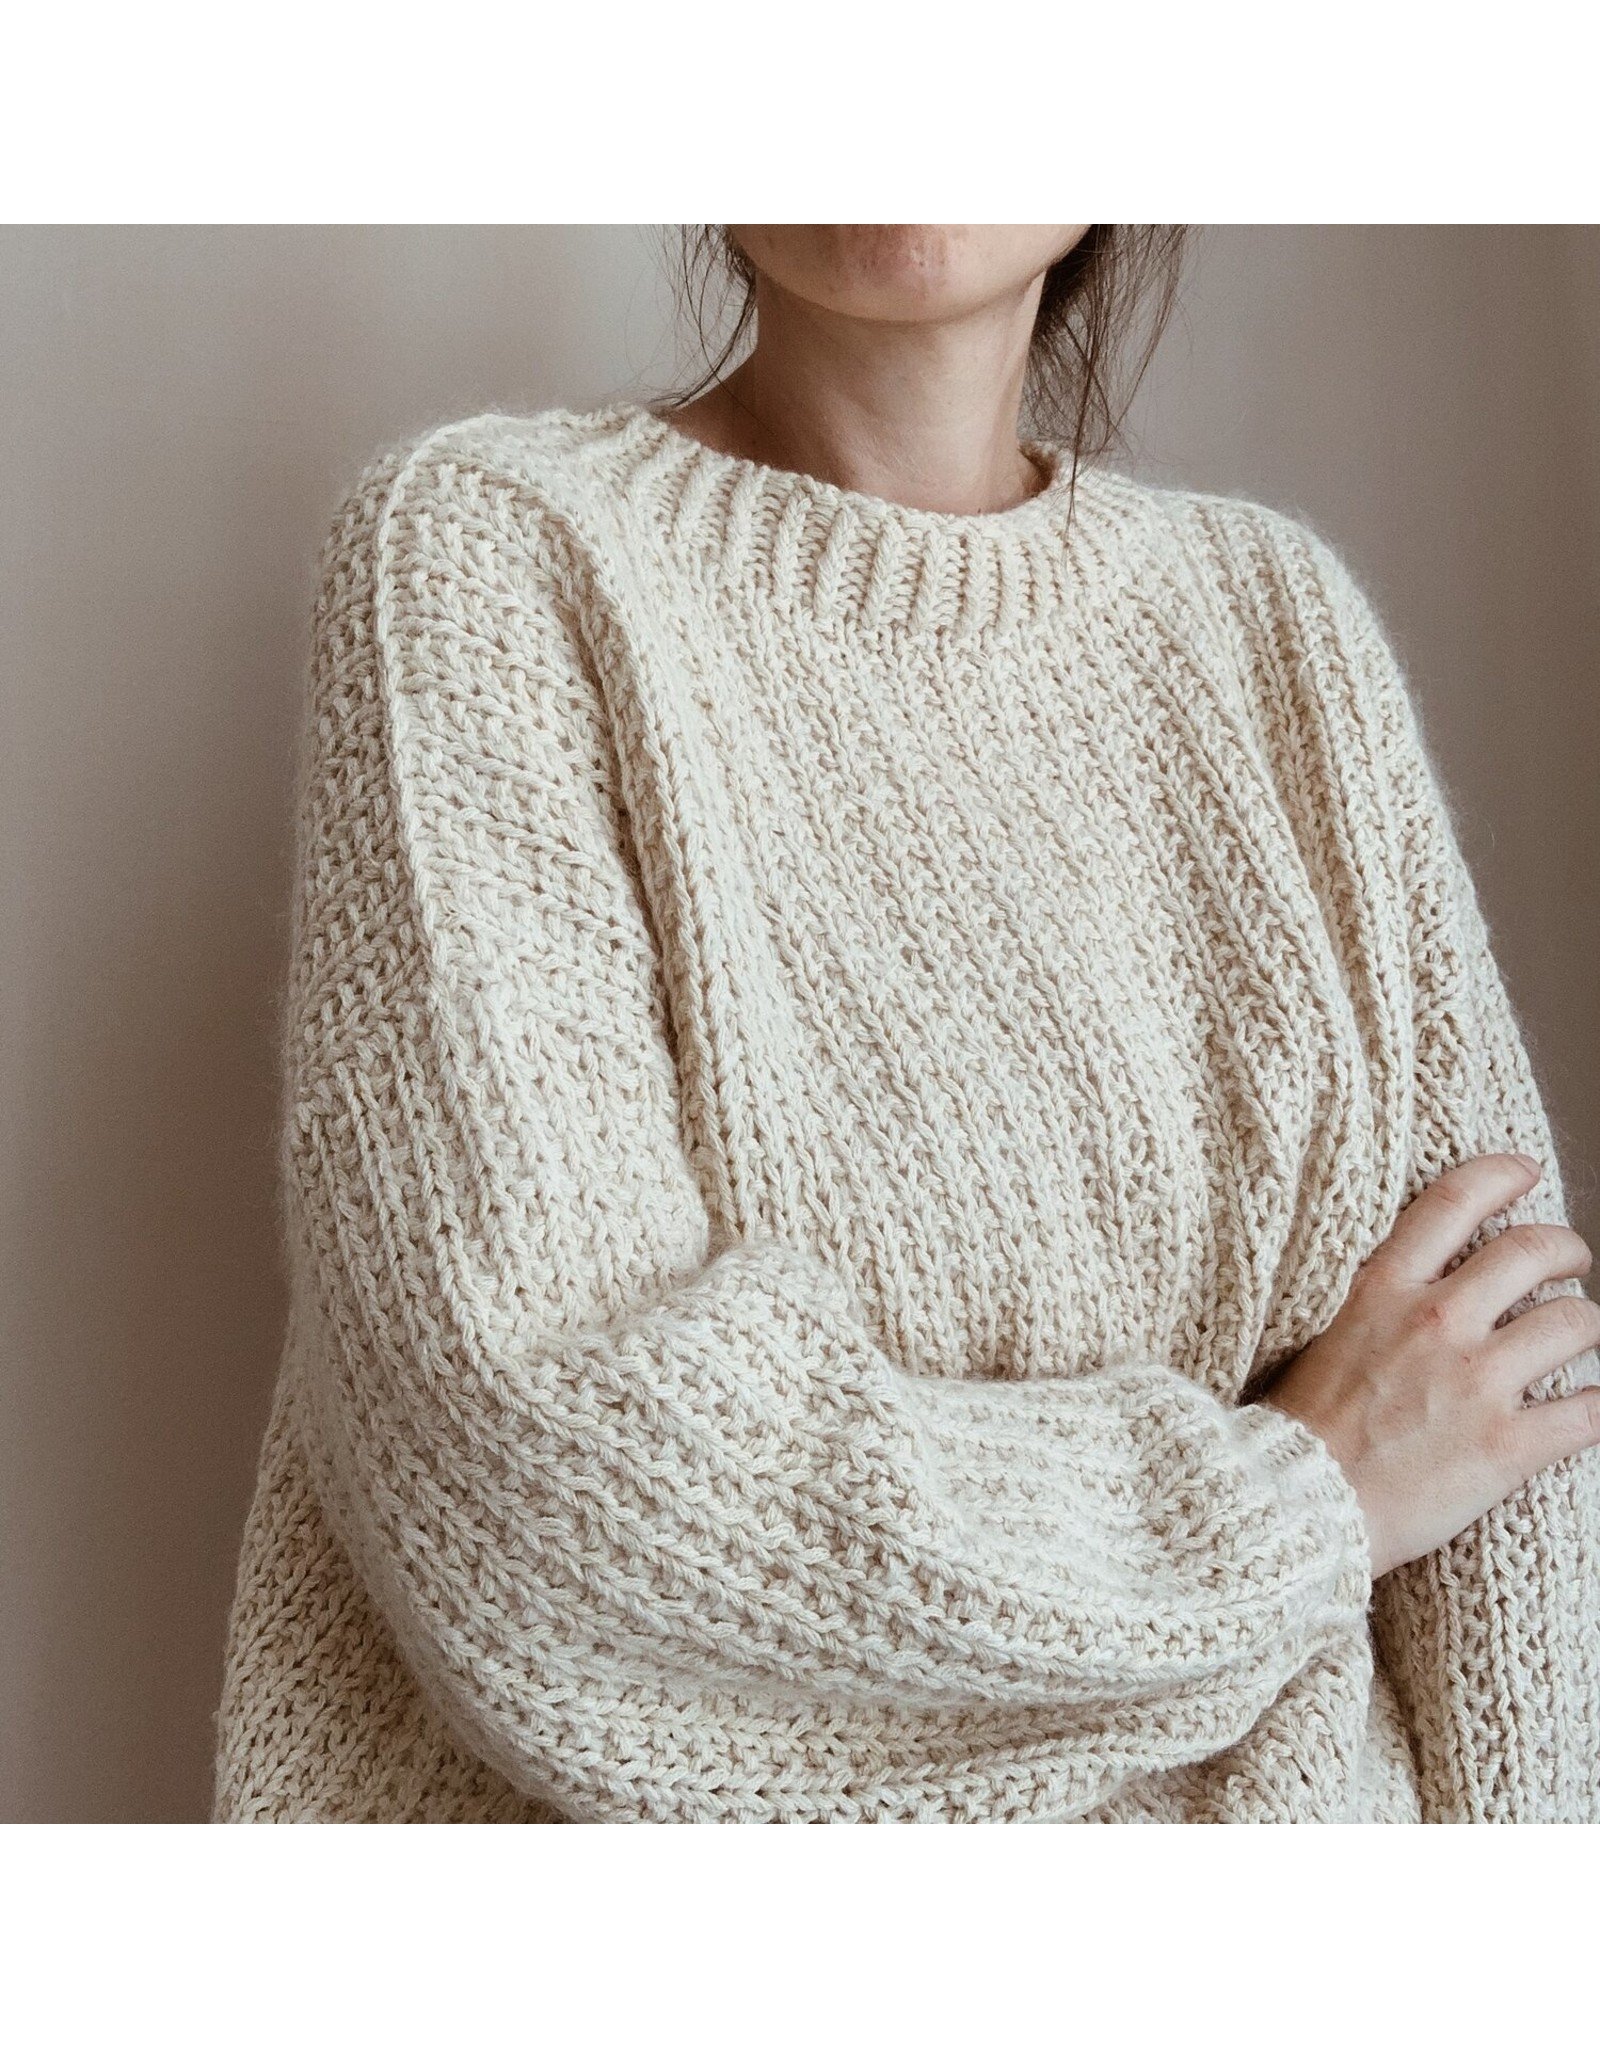 Patroon GF Velvety sweater oversized